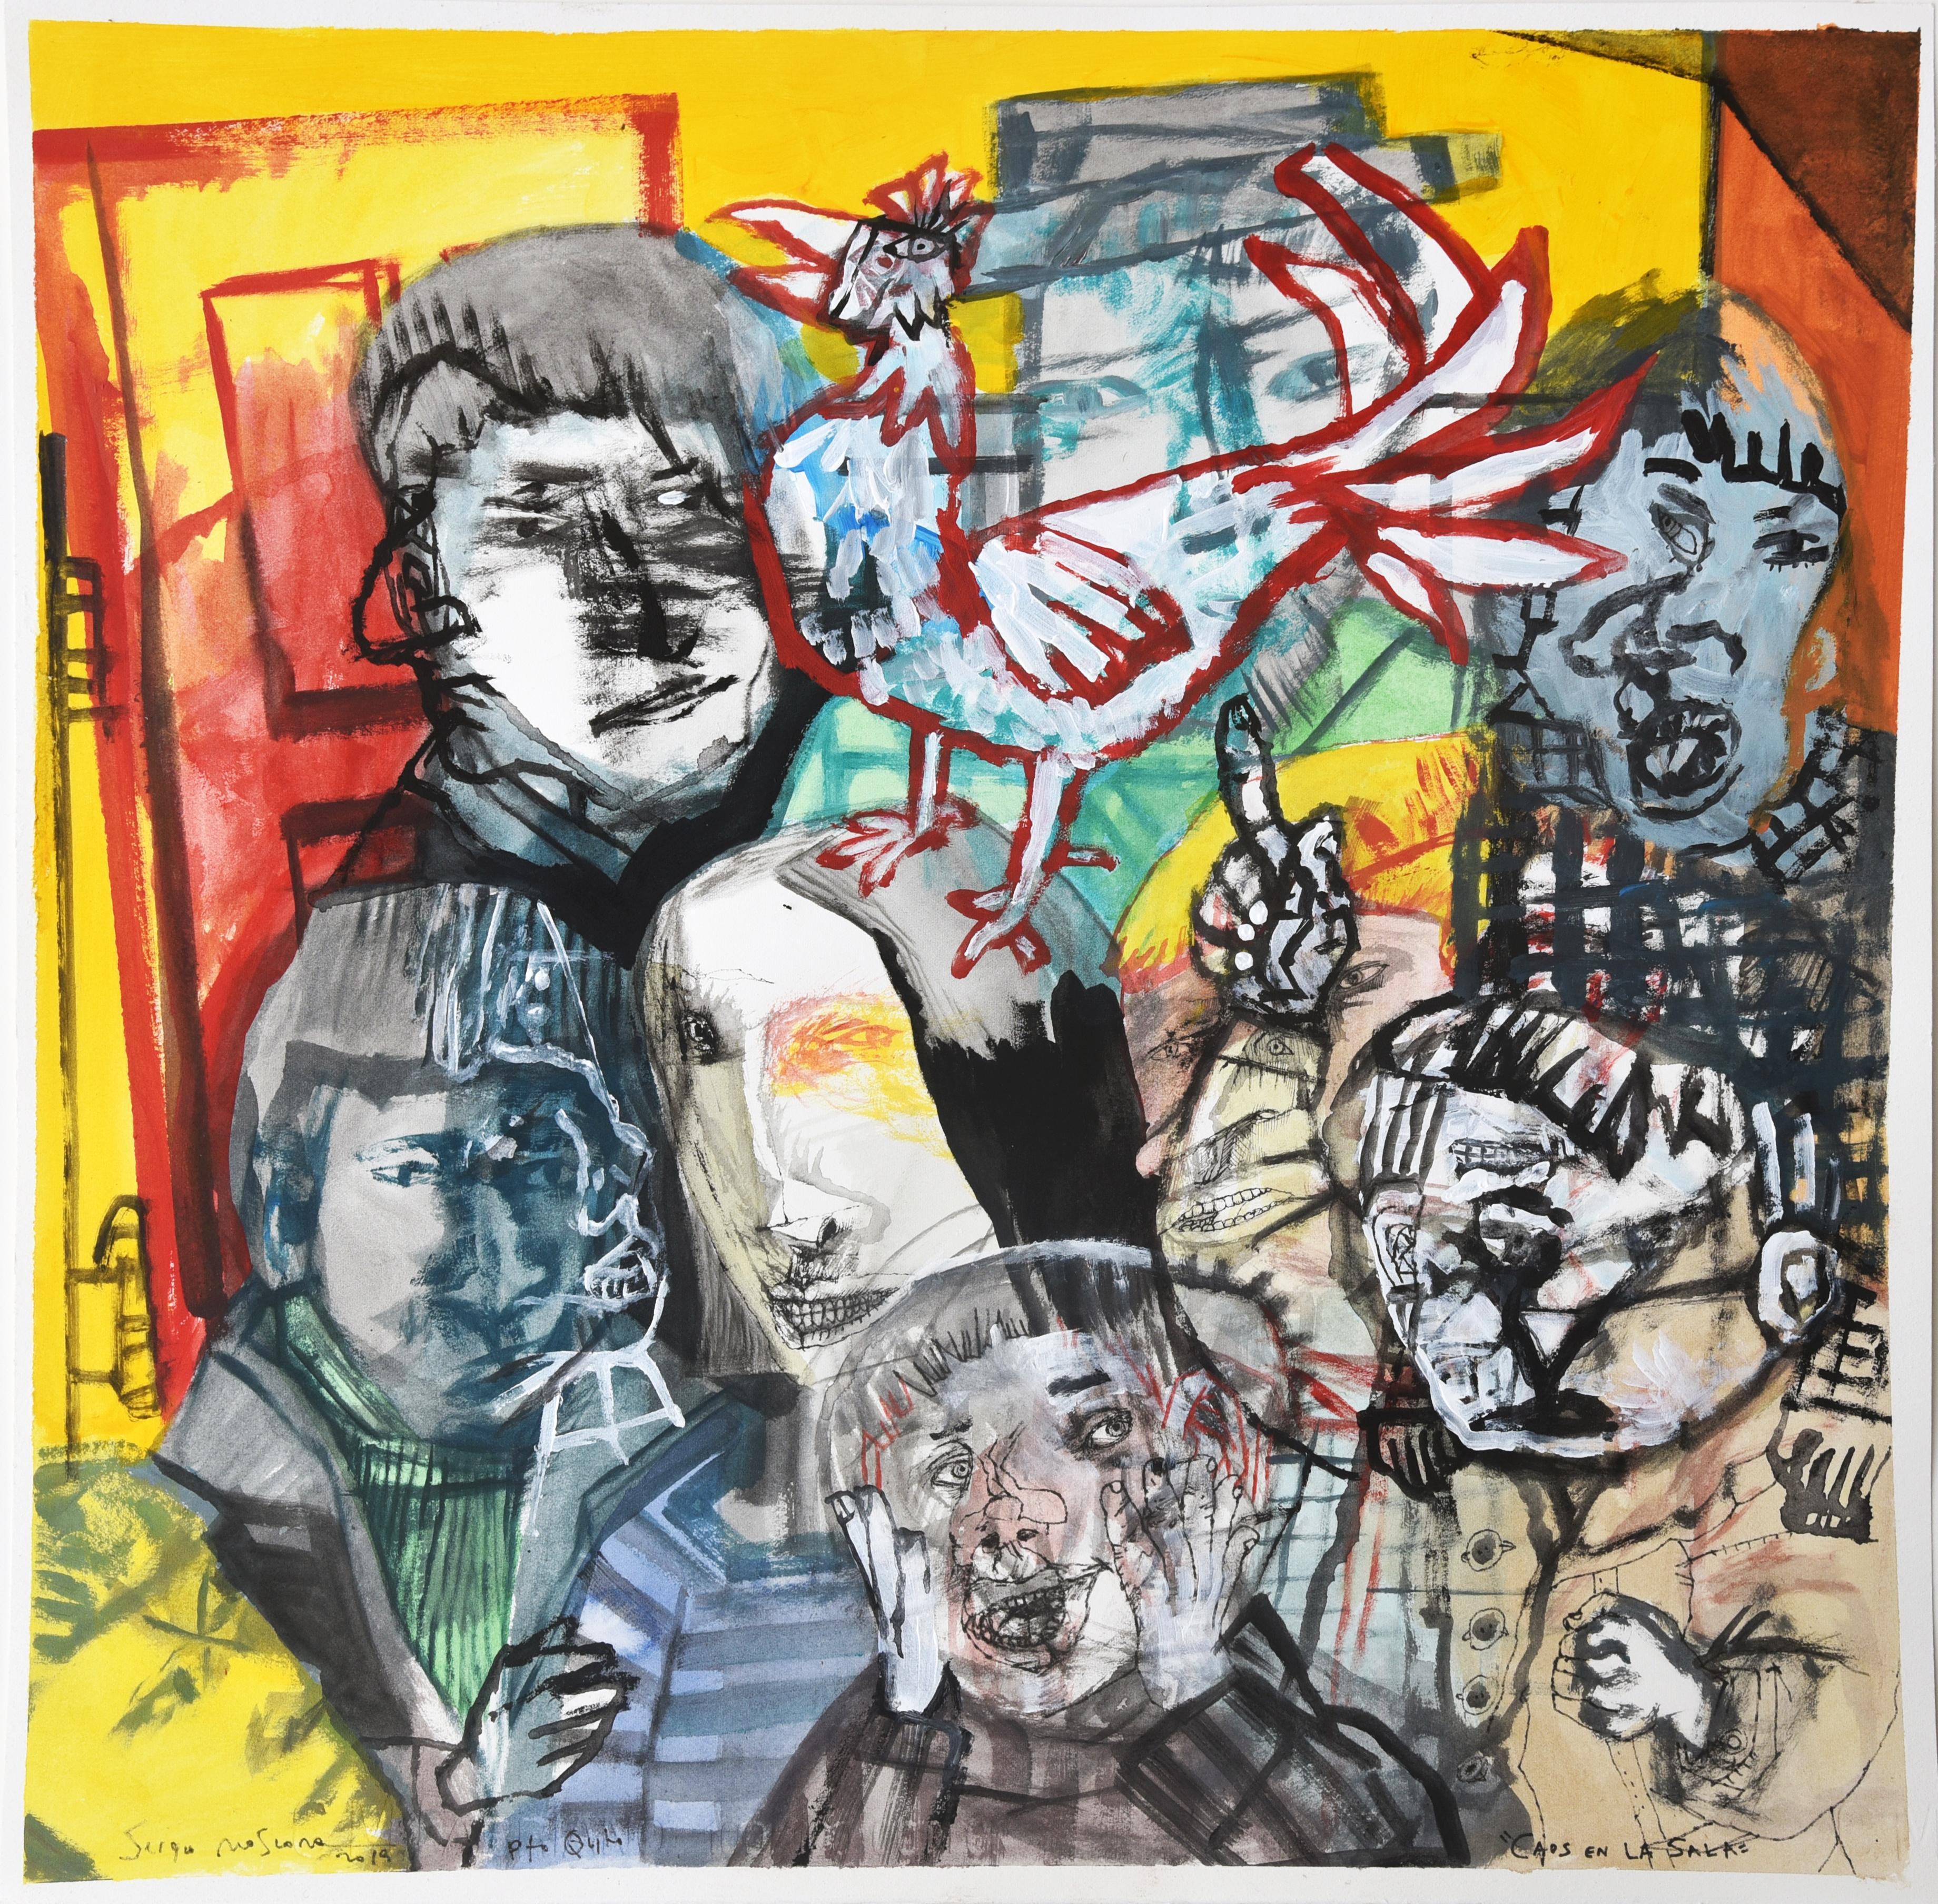 Caos en la sala - Sergio Moscona, 21st Century, Figurative painting